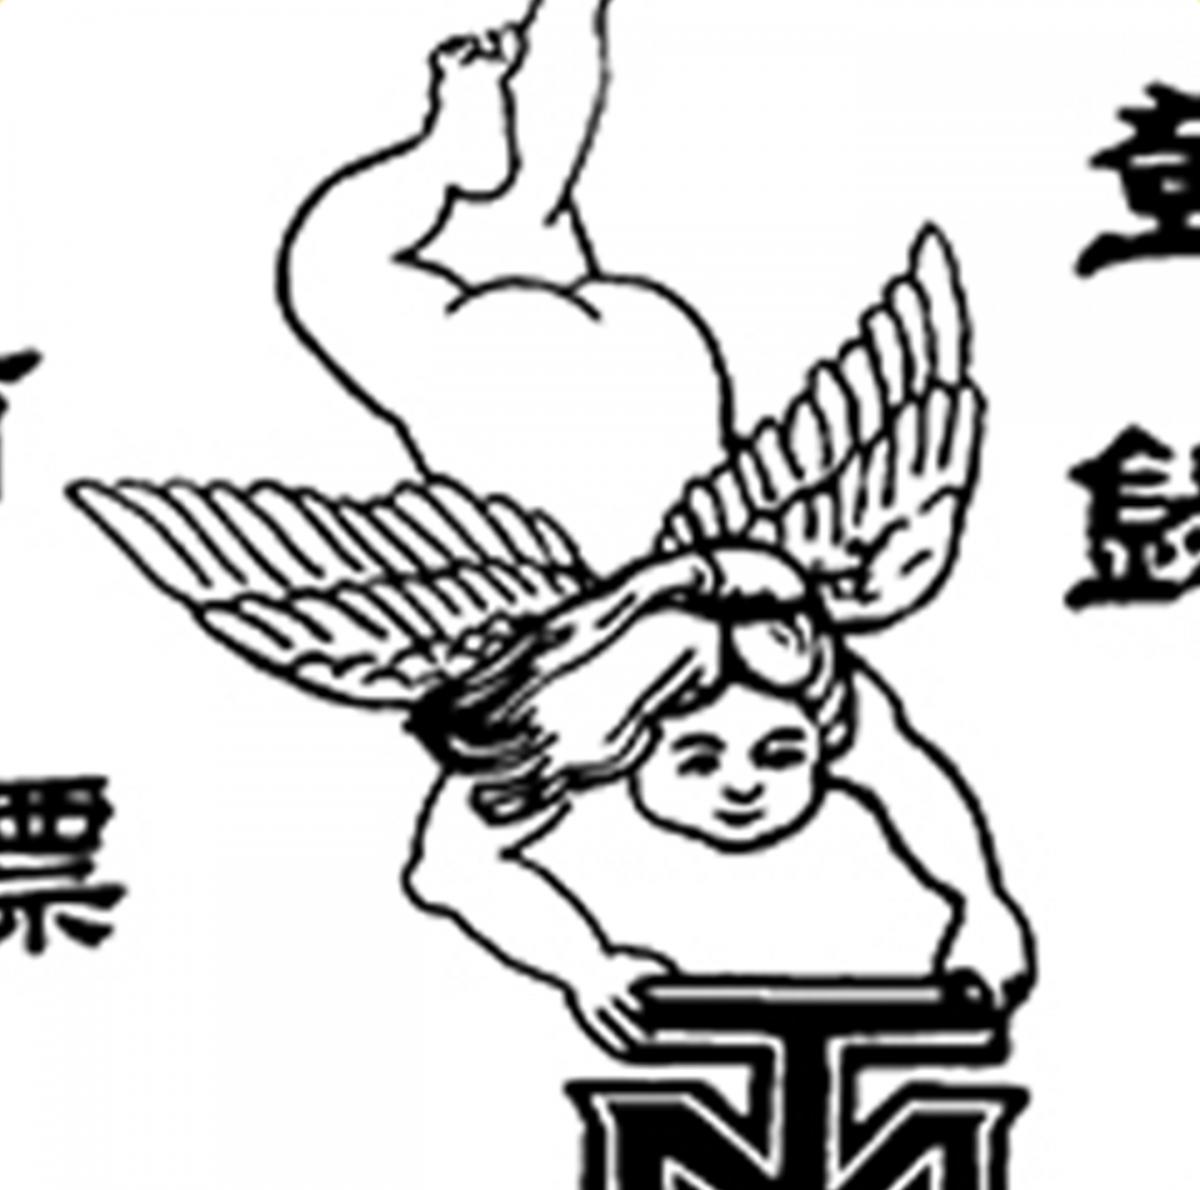 Morinaga 1905